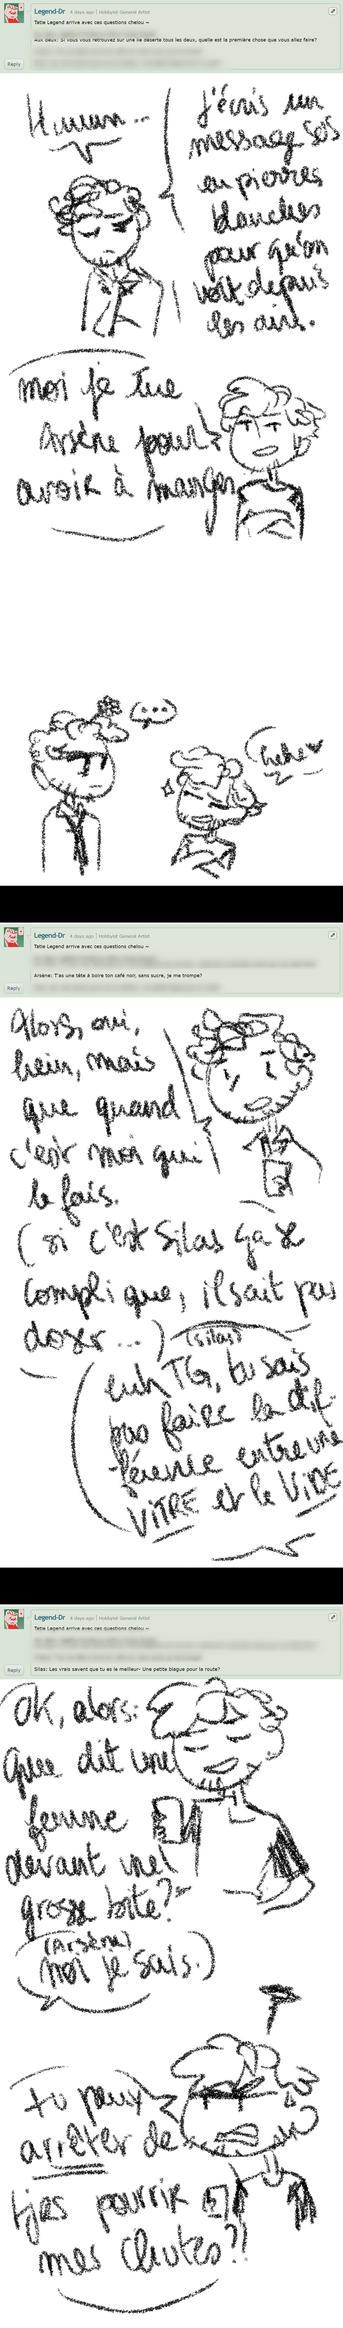 WCOMIC | Ask my OC - REP #3 B by Clo-Asis